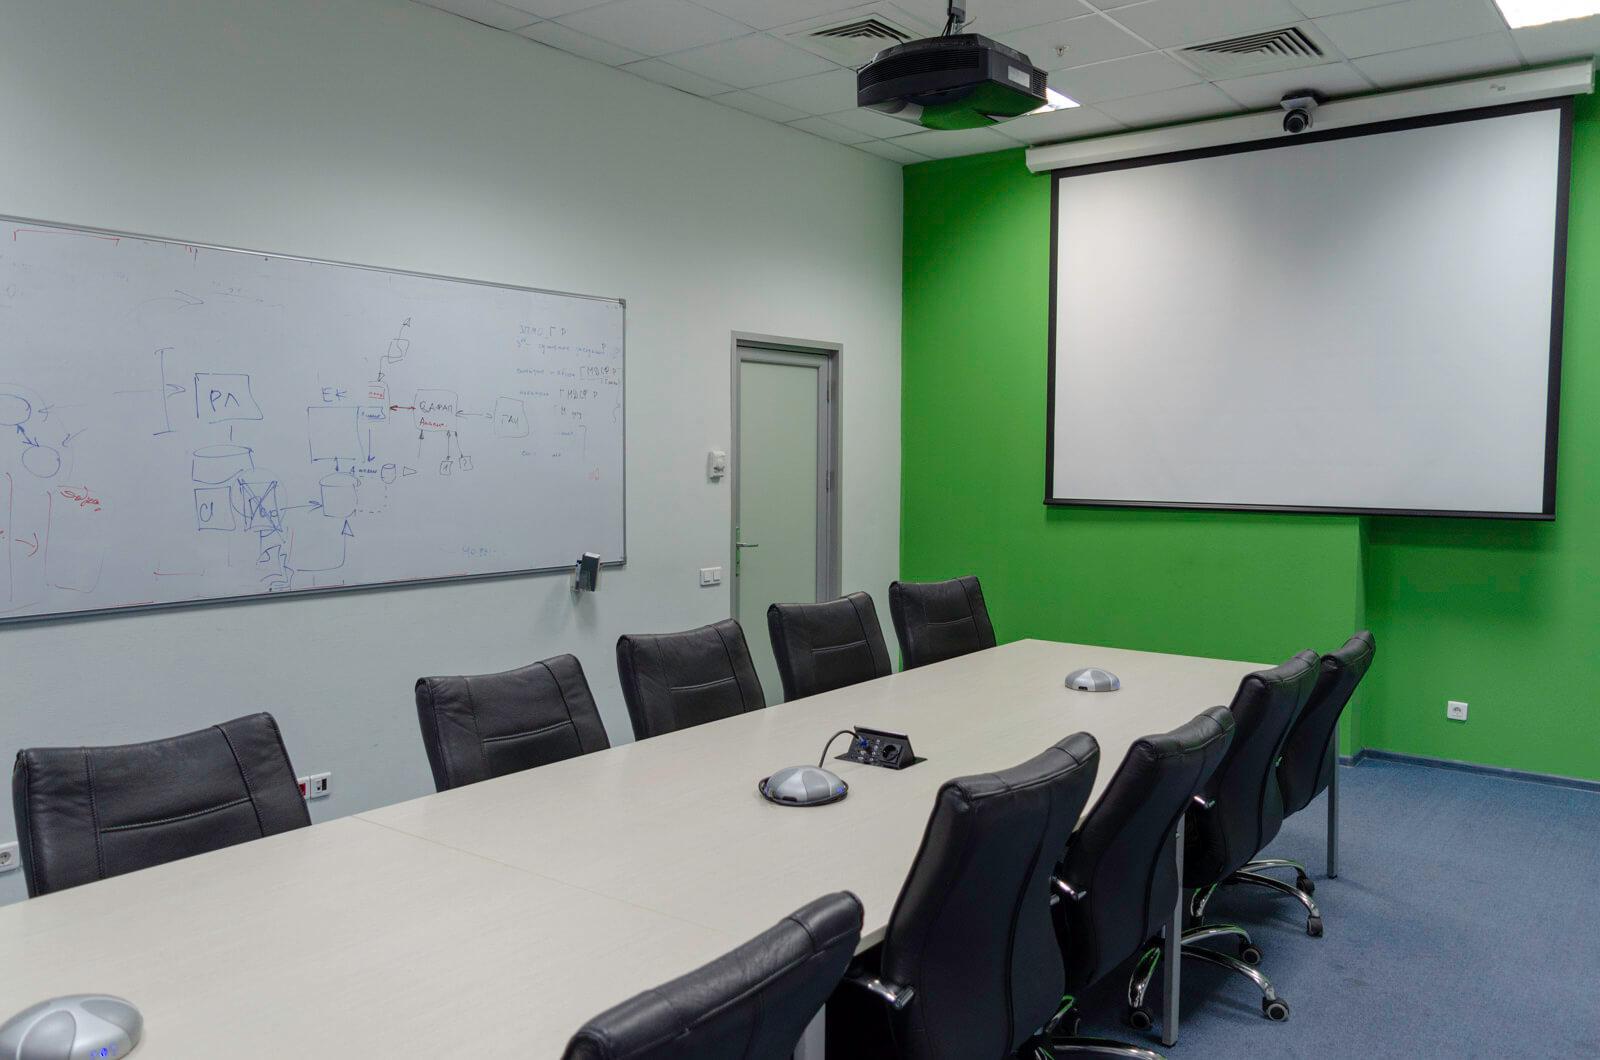 Конференц-залы для МОЦ ИКТ